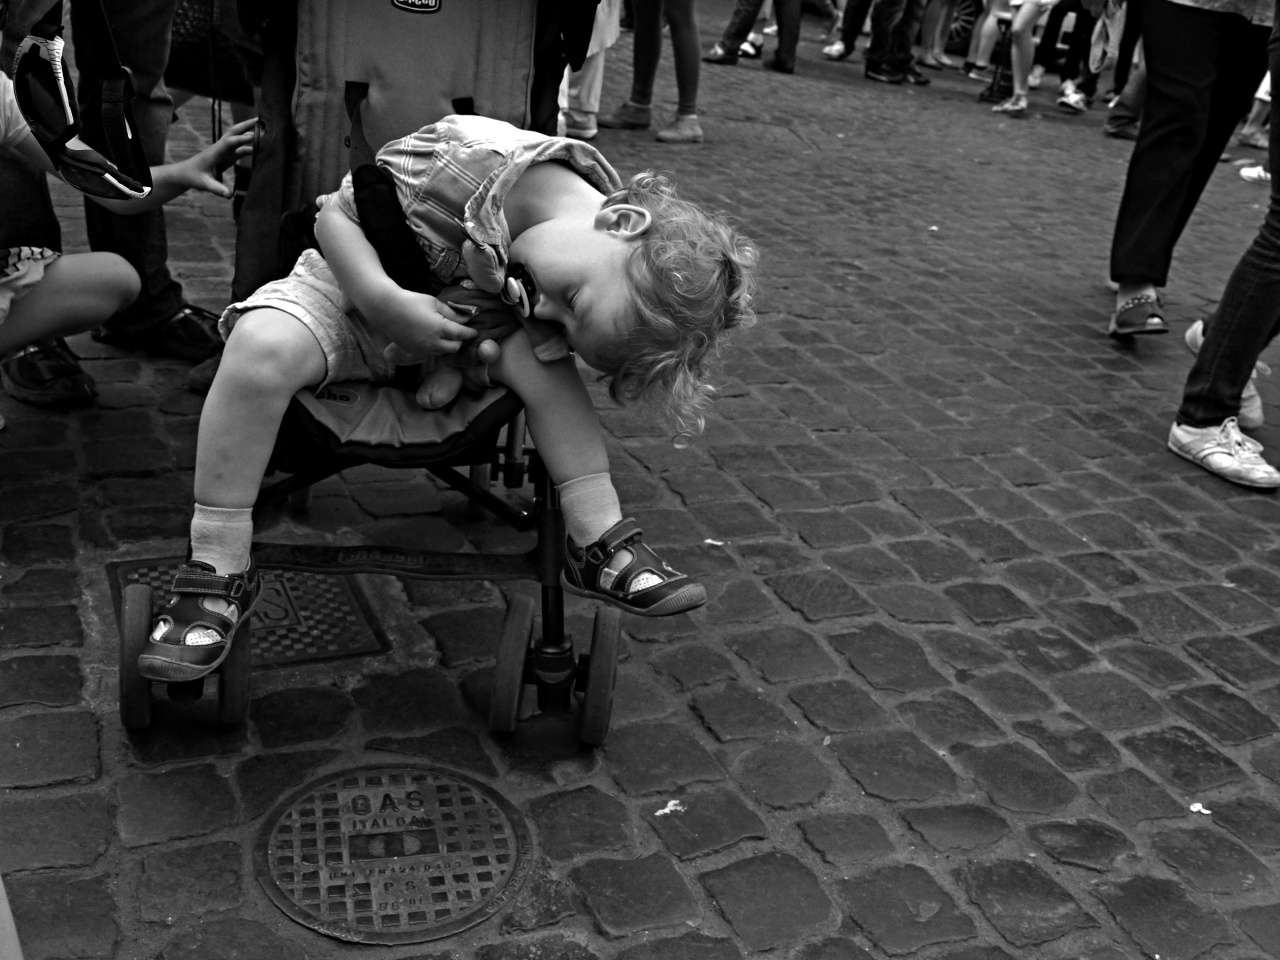 © Amos Farnitano - amosfarnitano.it